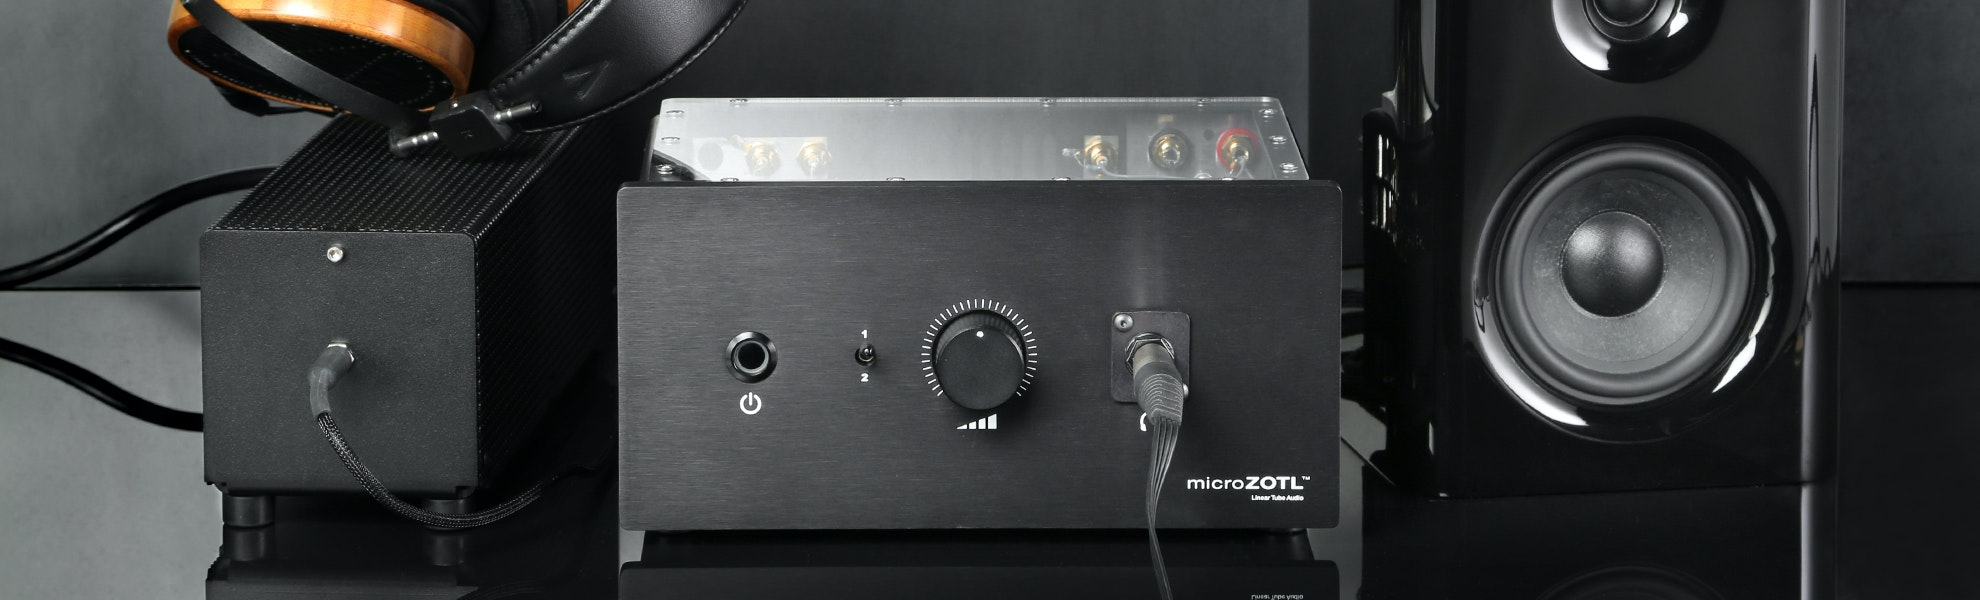 Linear Tube Audio MZ2-S Amp Exclusive Launch